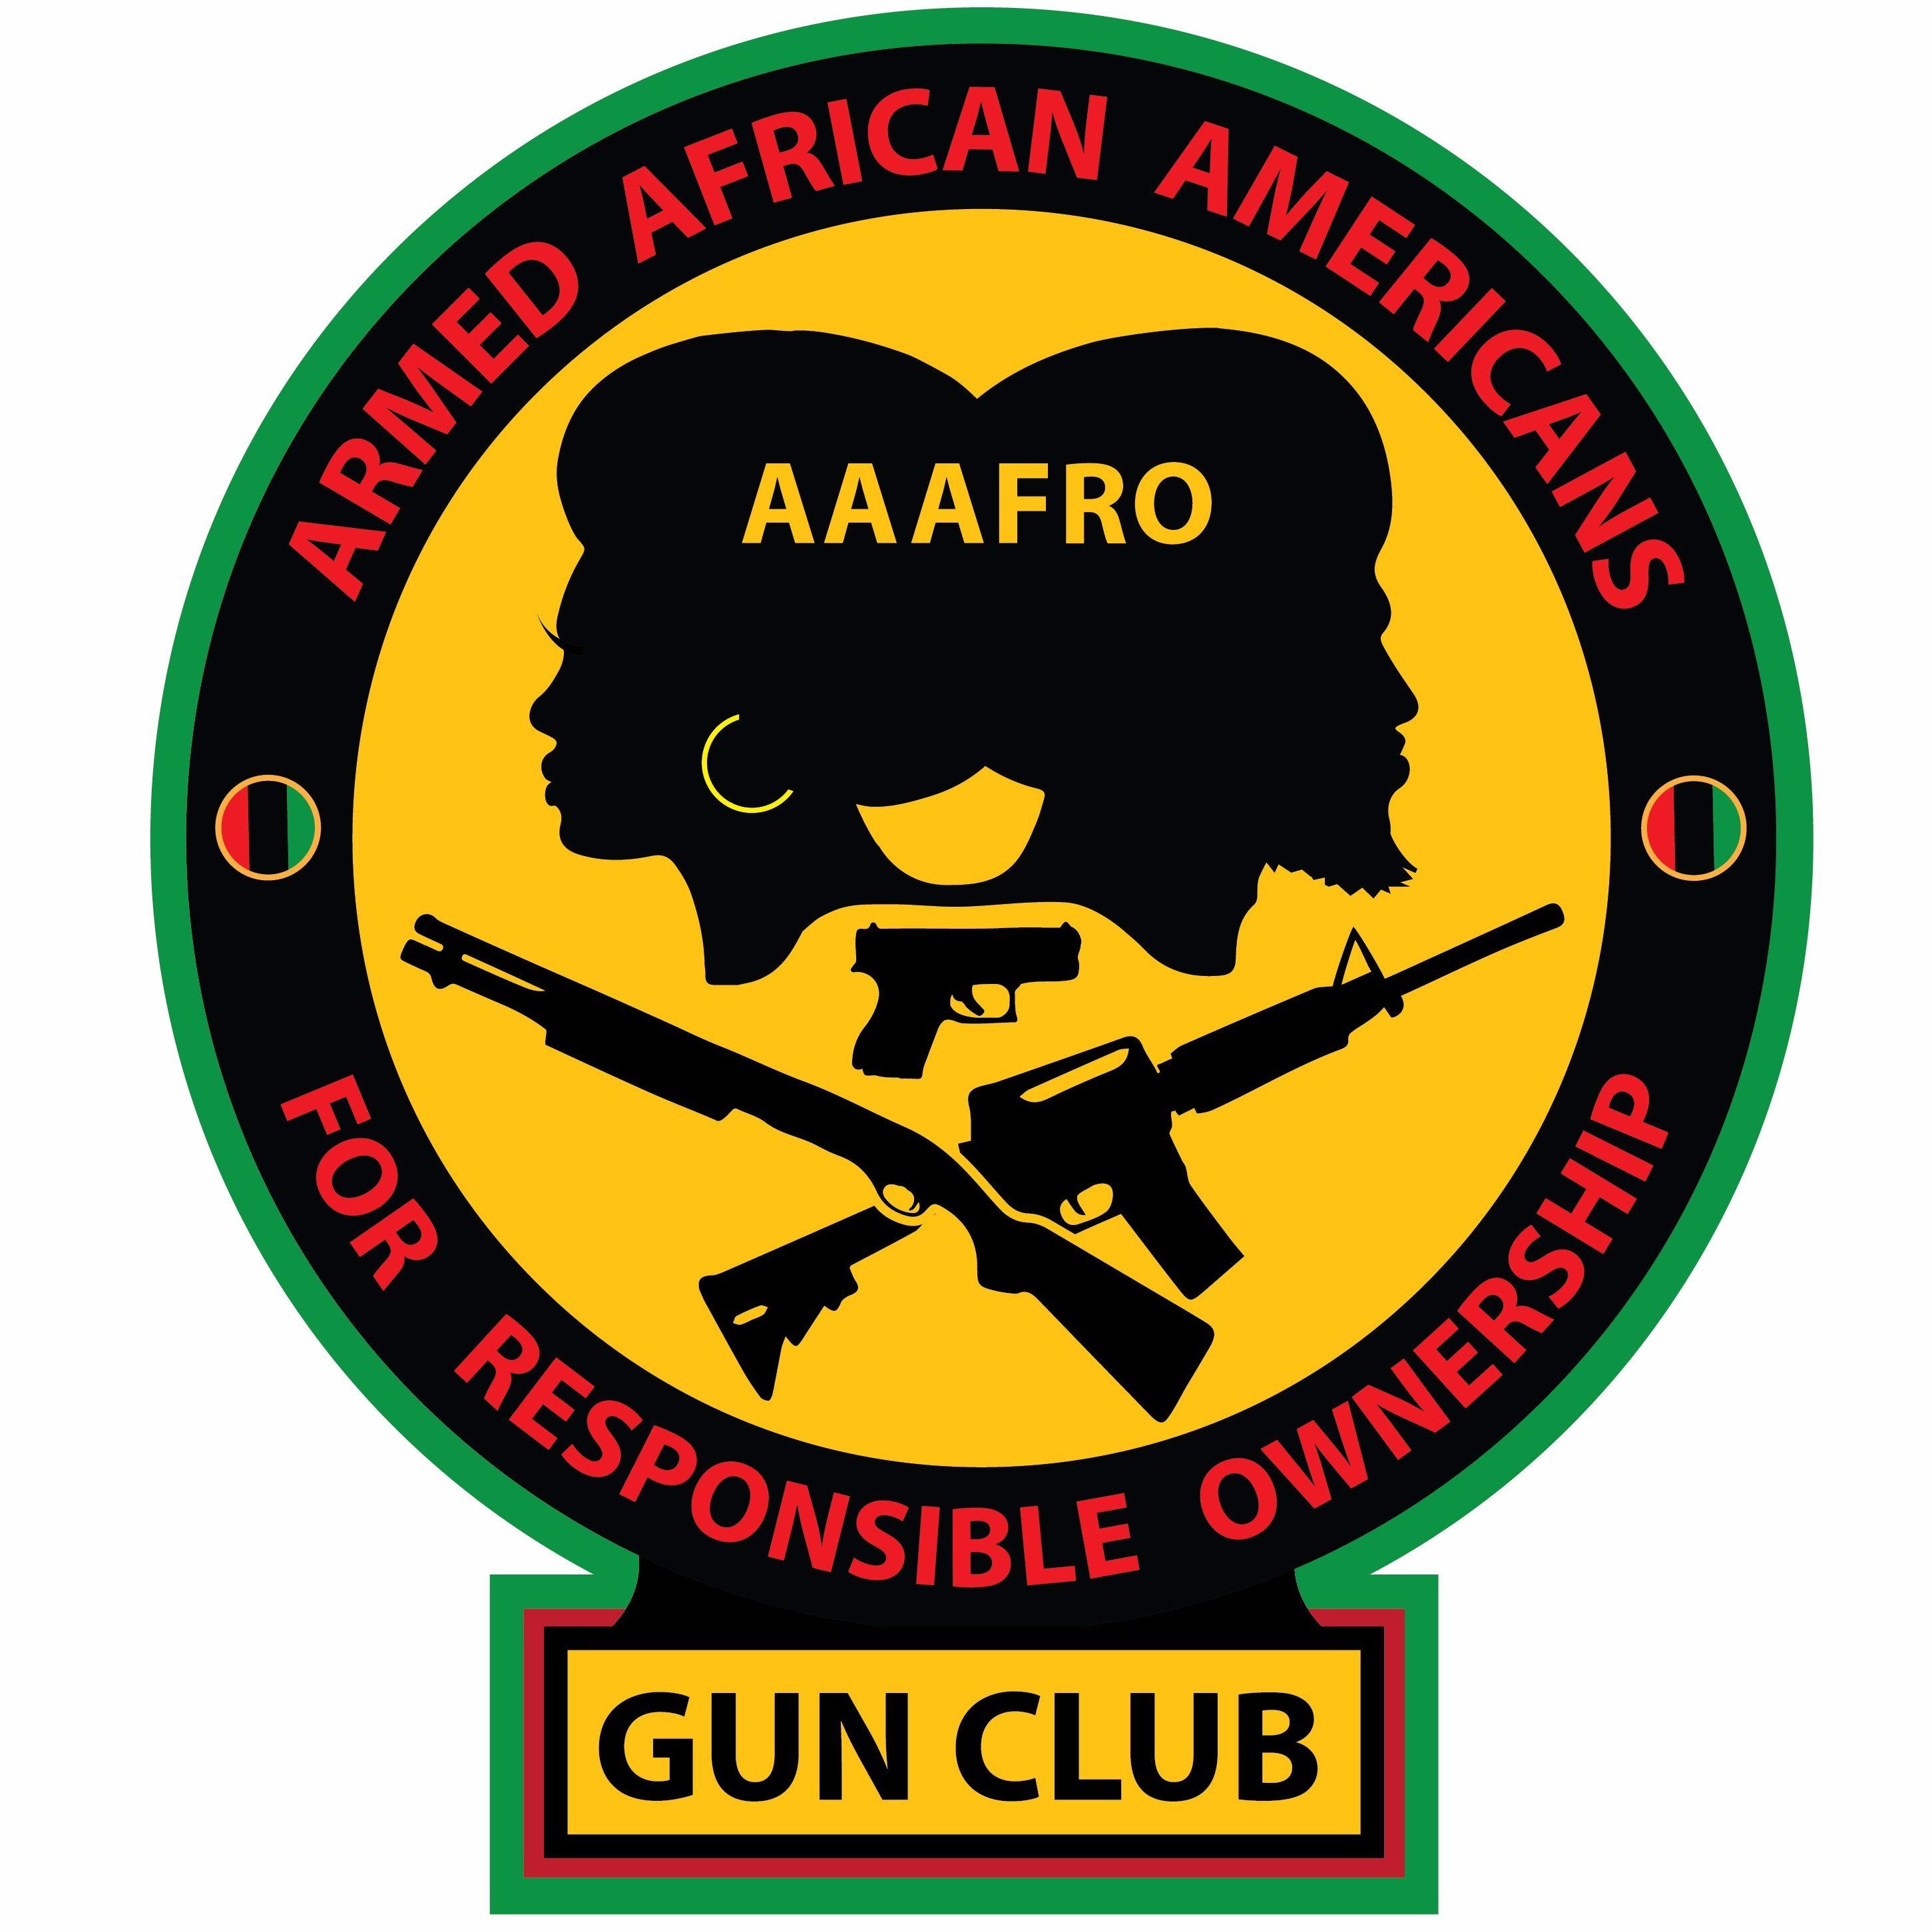 AAAFRO Gun Club